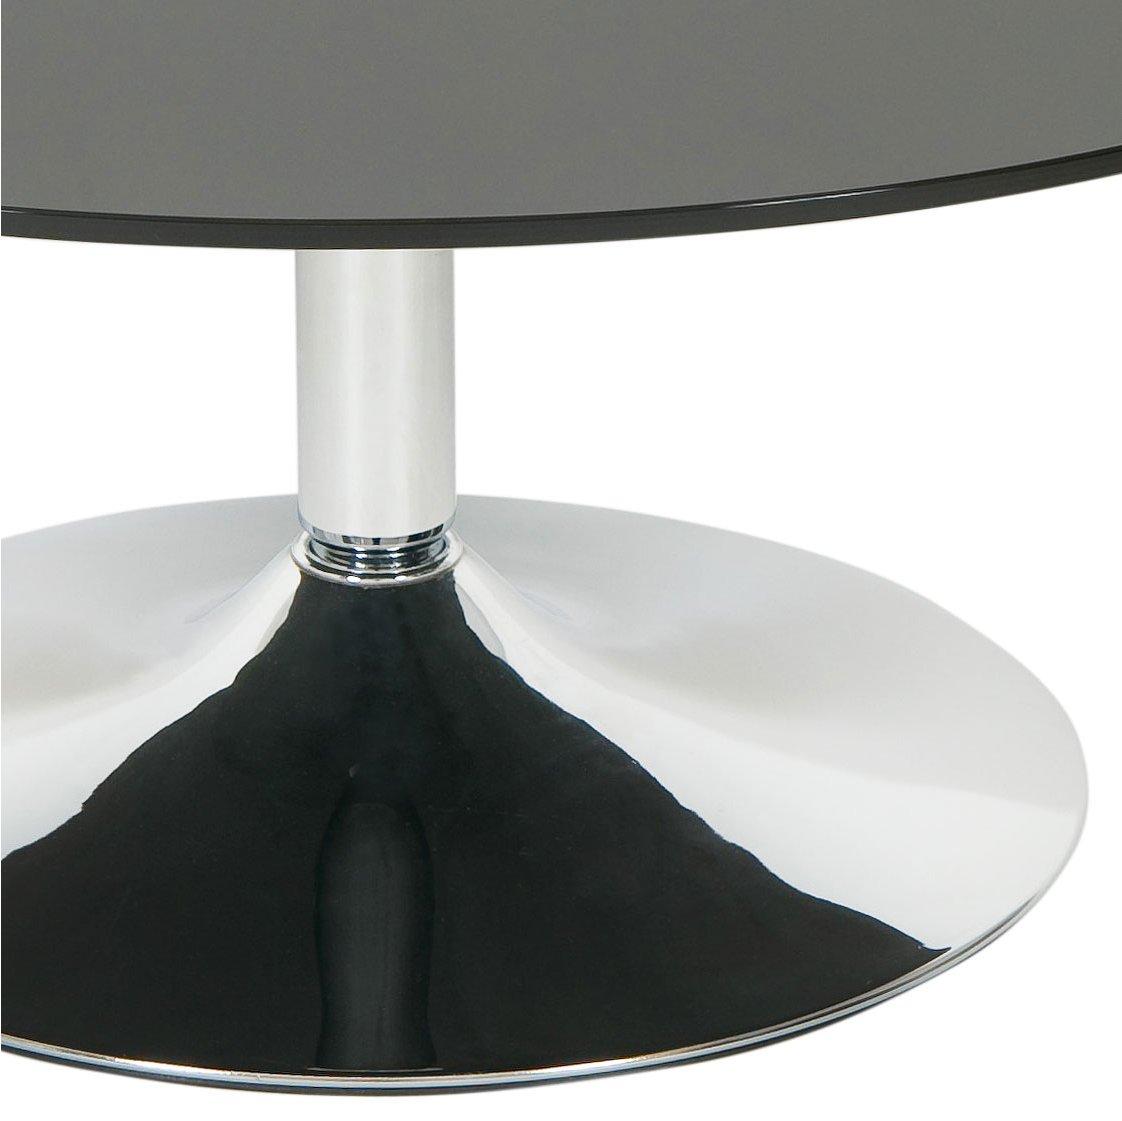 Black Glass Round Coffee Table: LEVV ROCOFBC Roma Black Glass Round Coffee Table